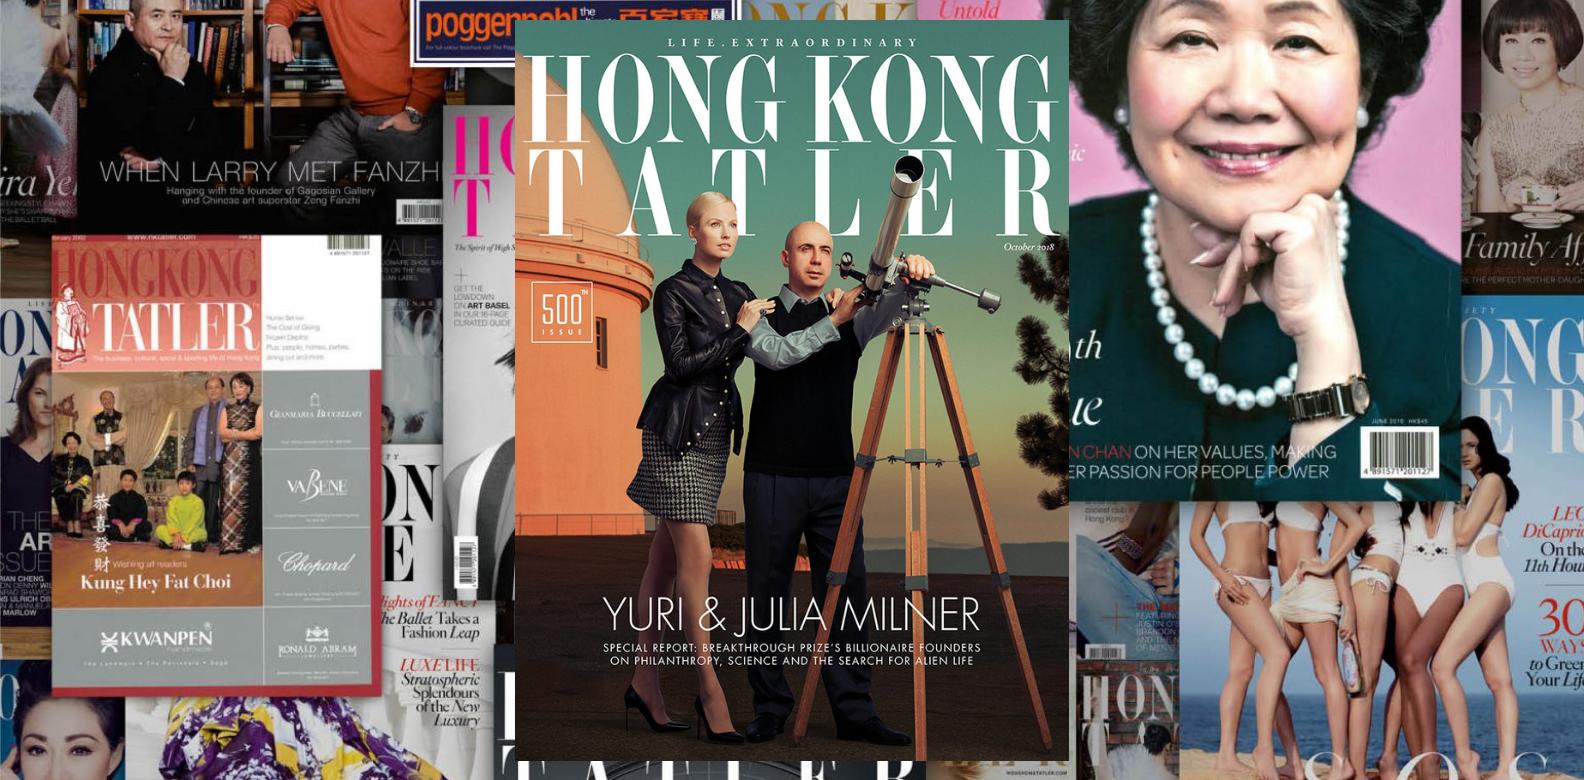 Hong Kong Tatler Celebrates 500 Issues